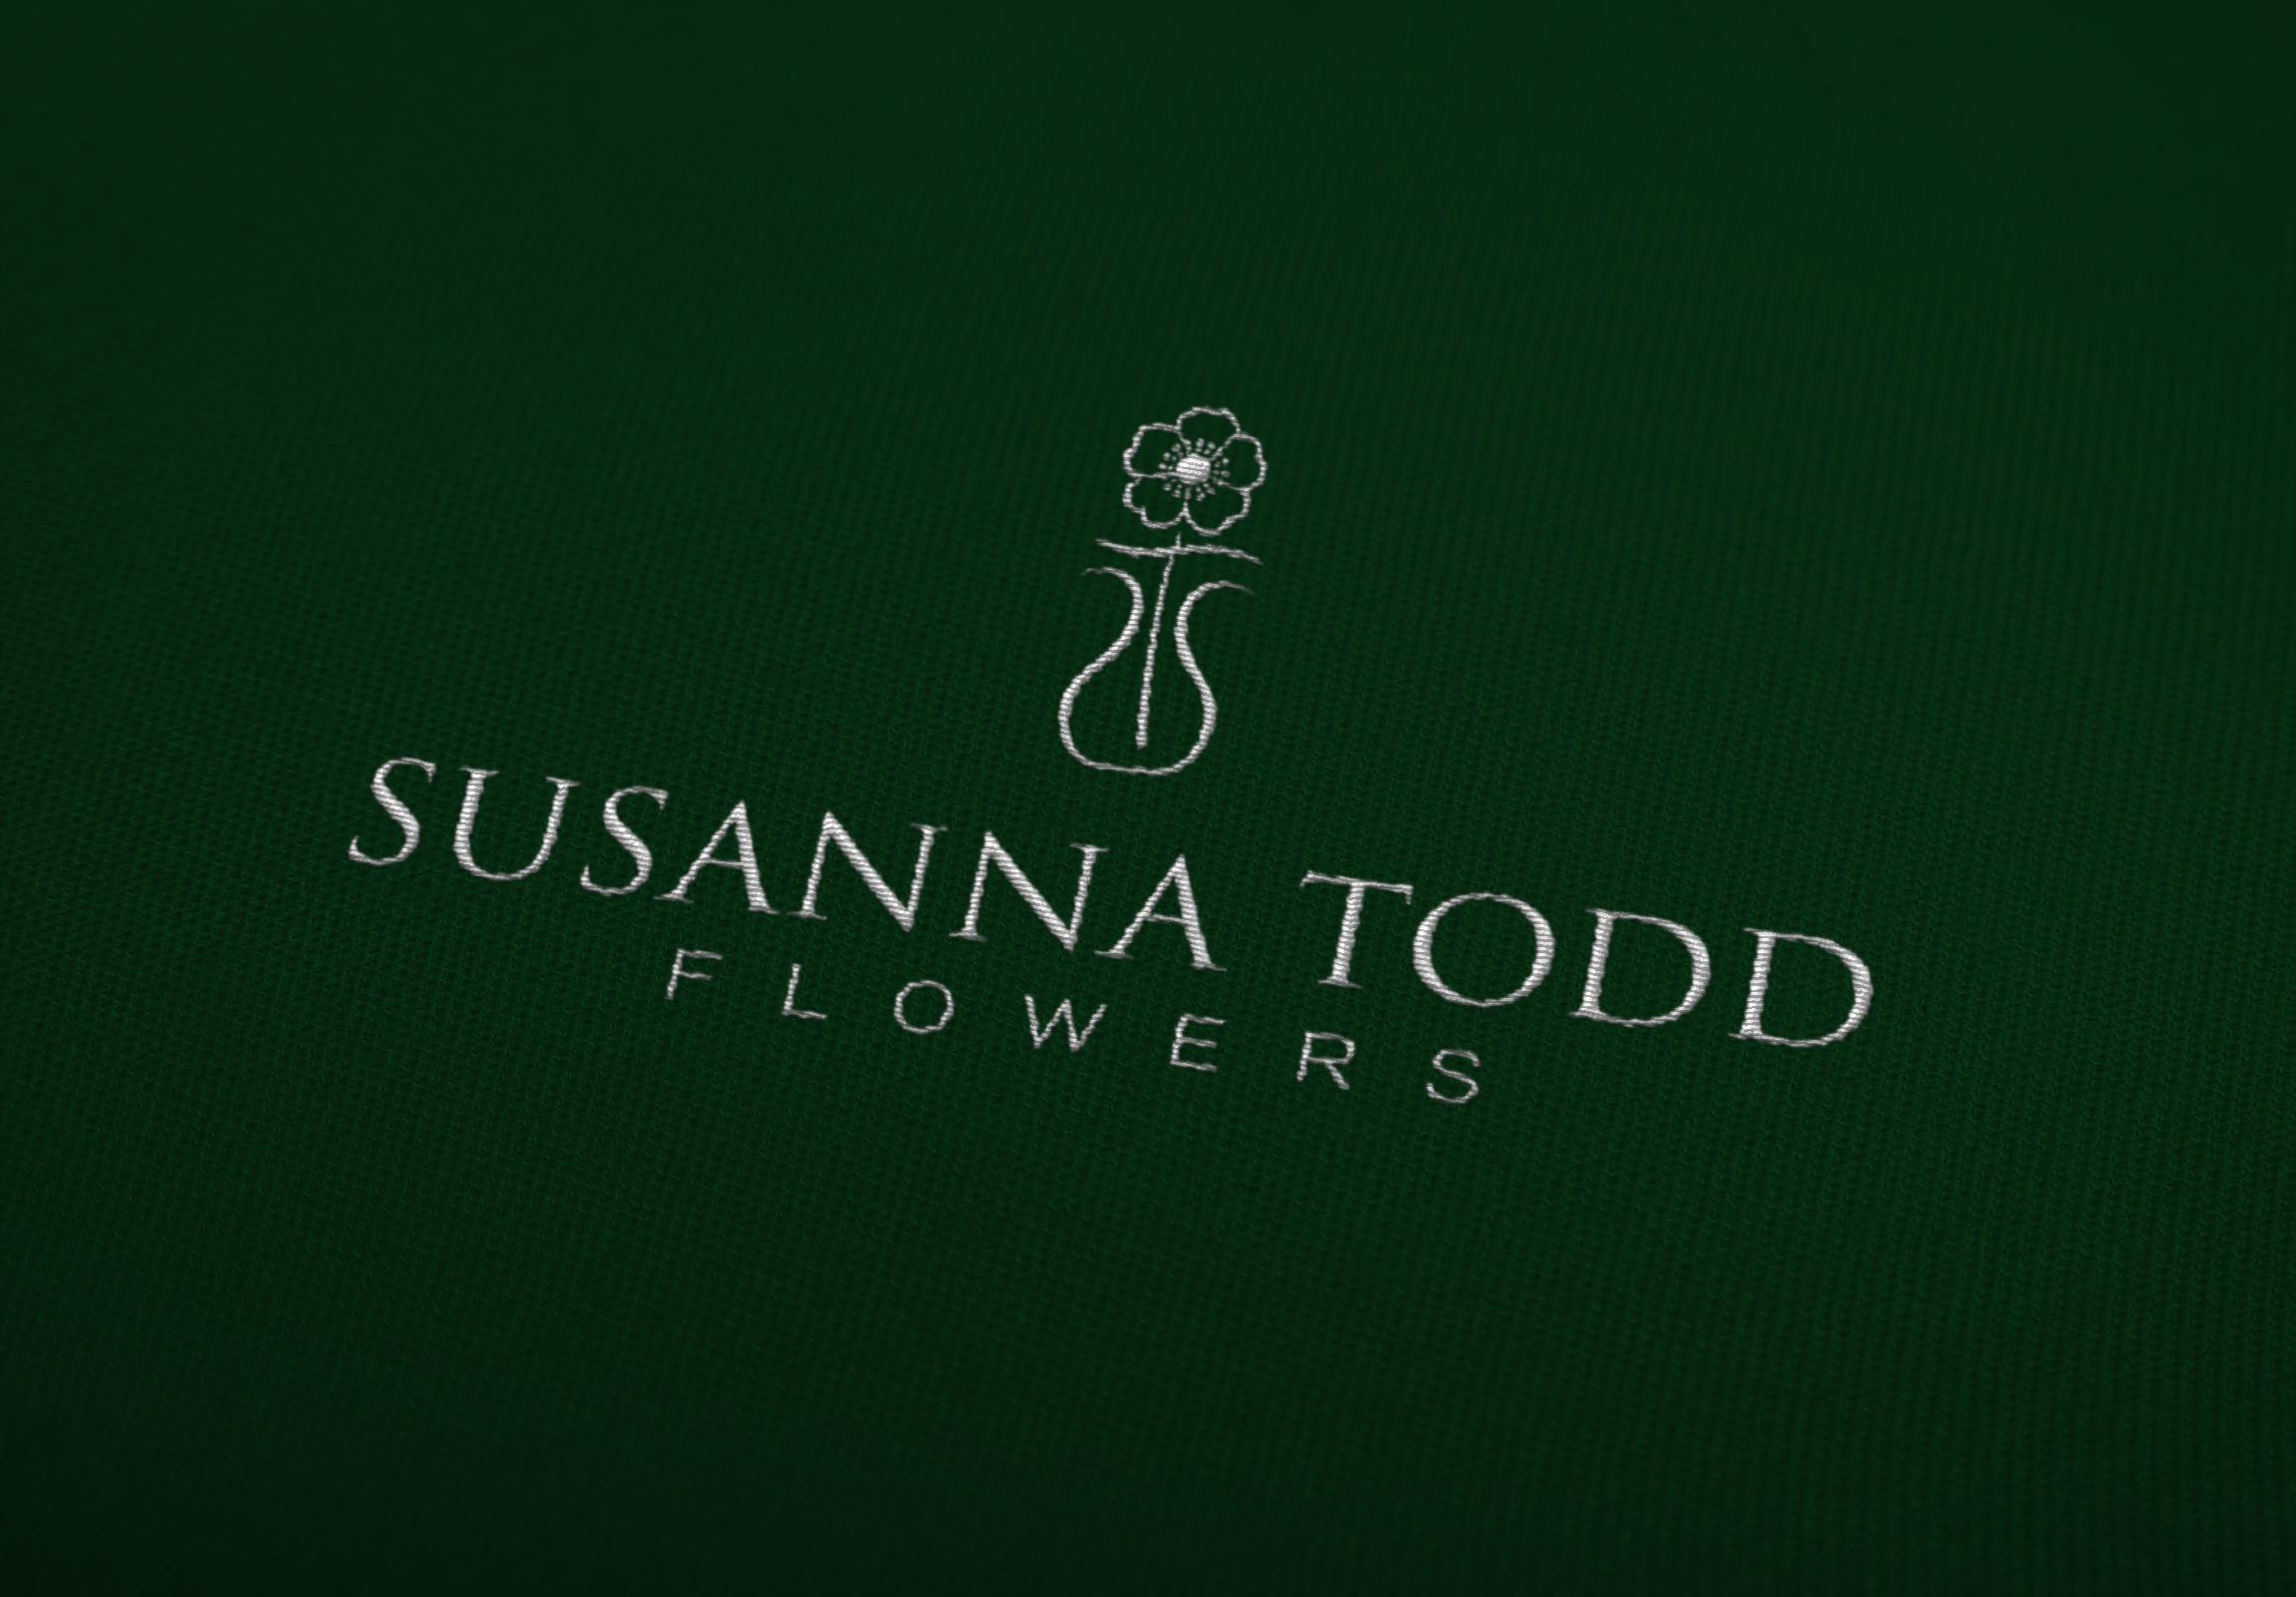 Susanna Embroidered Logo MockUp.jpg